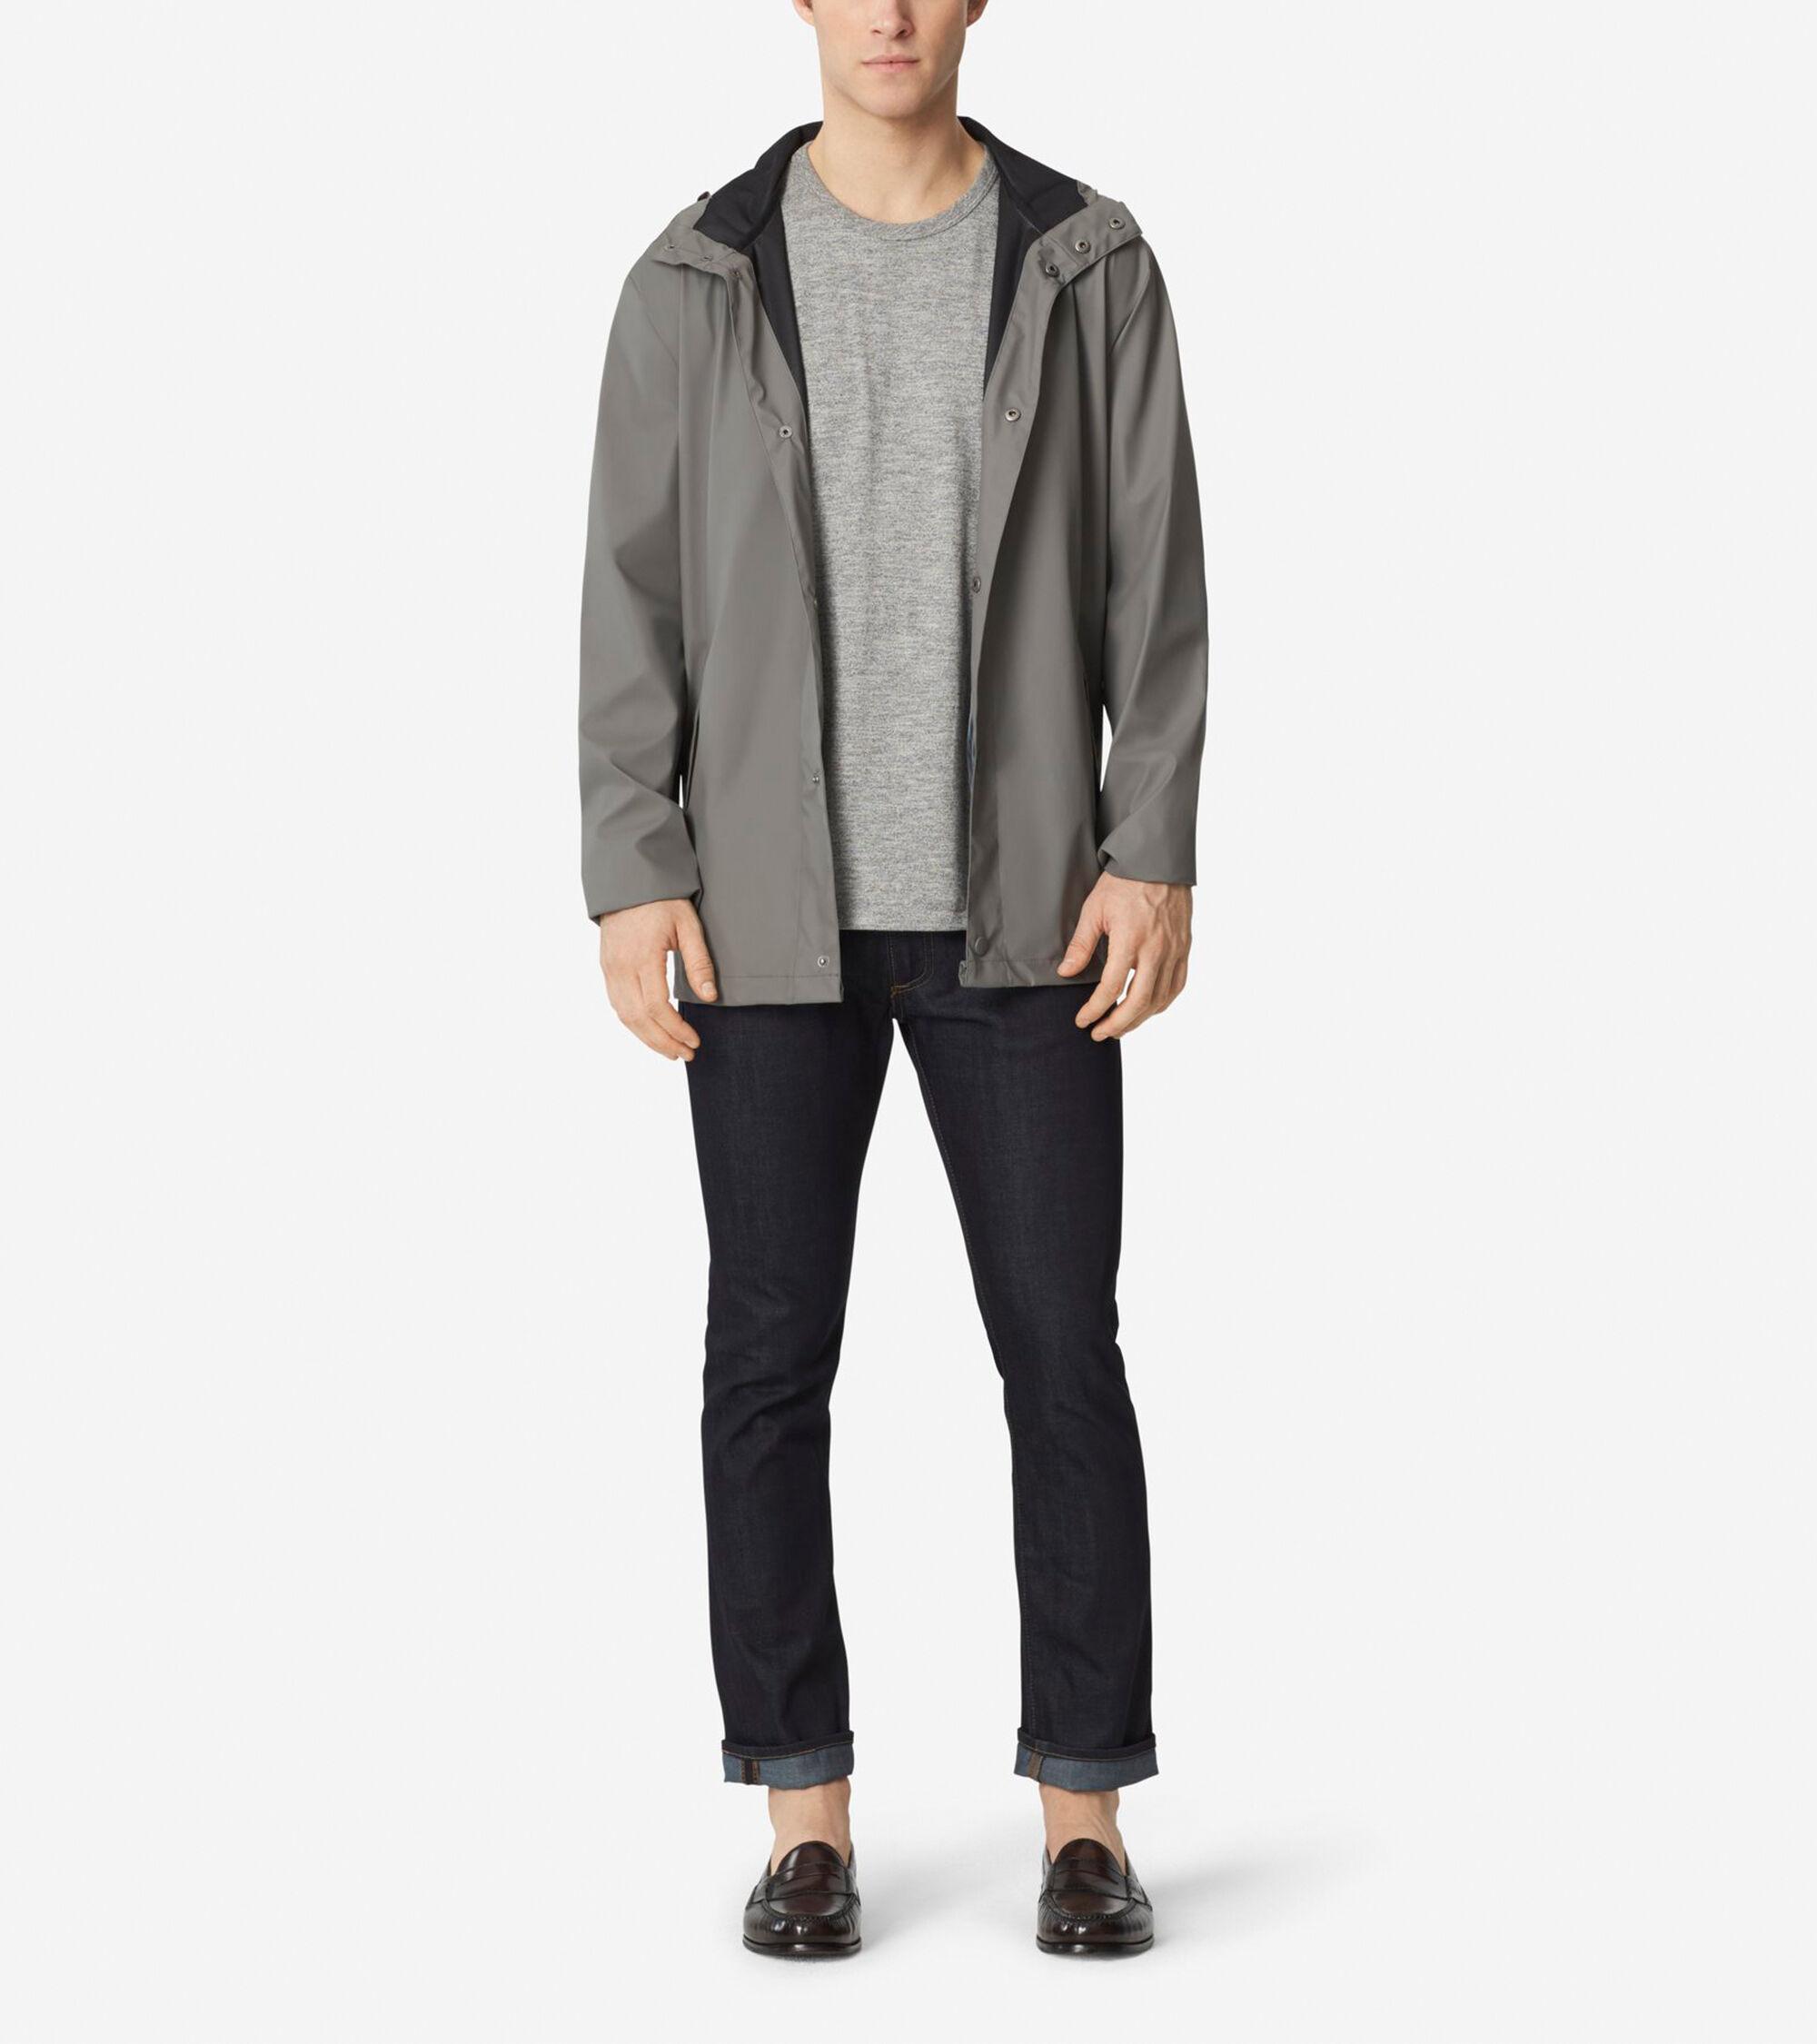 Cole Haan Mens Pinch Rain Jacket